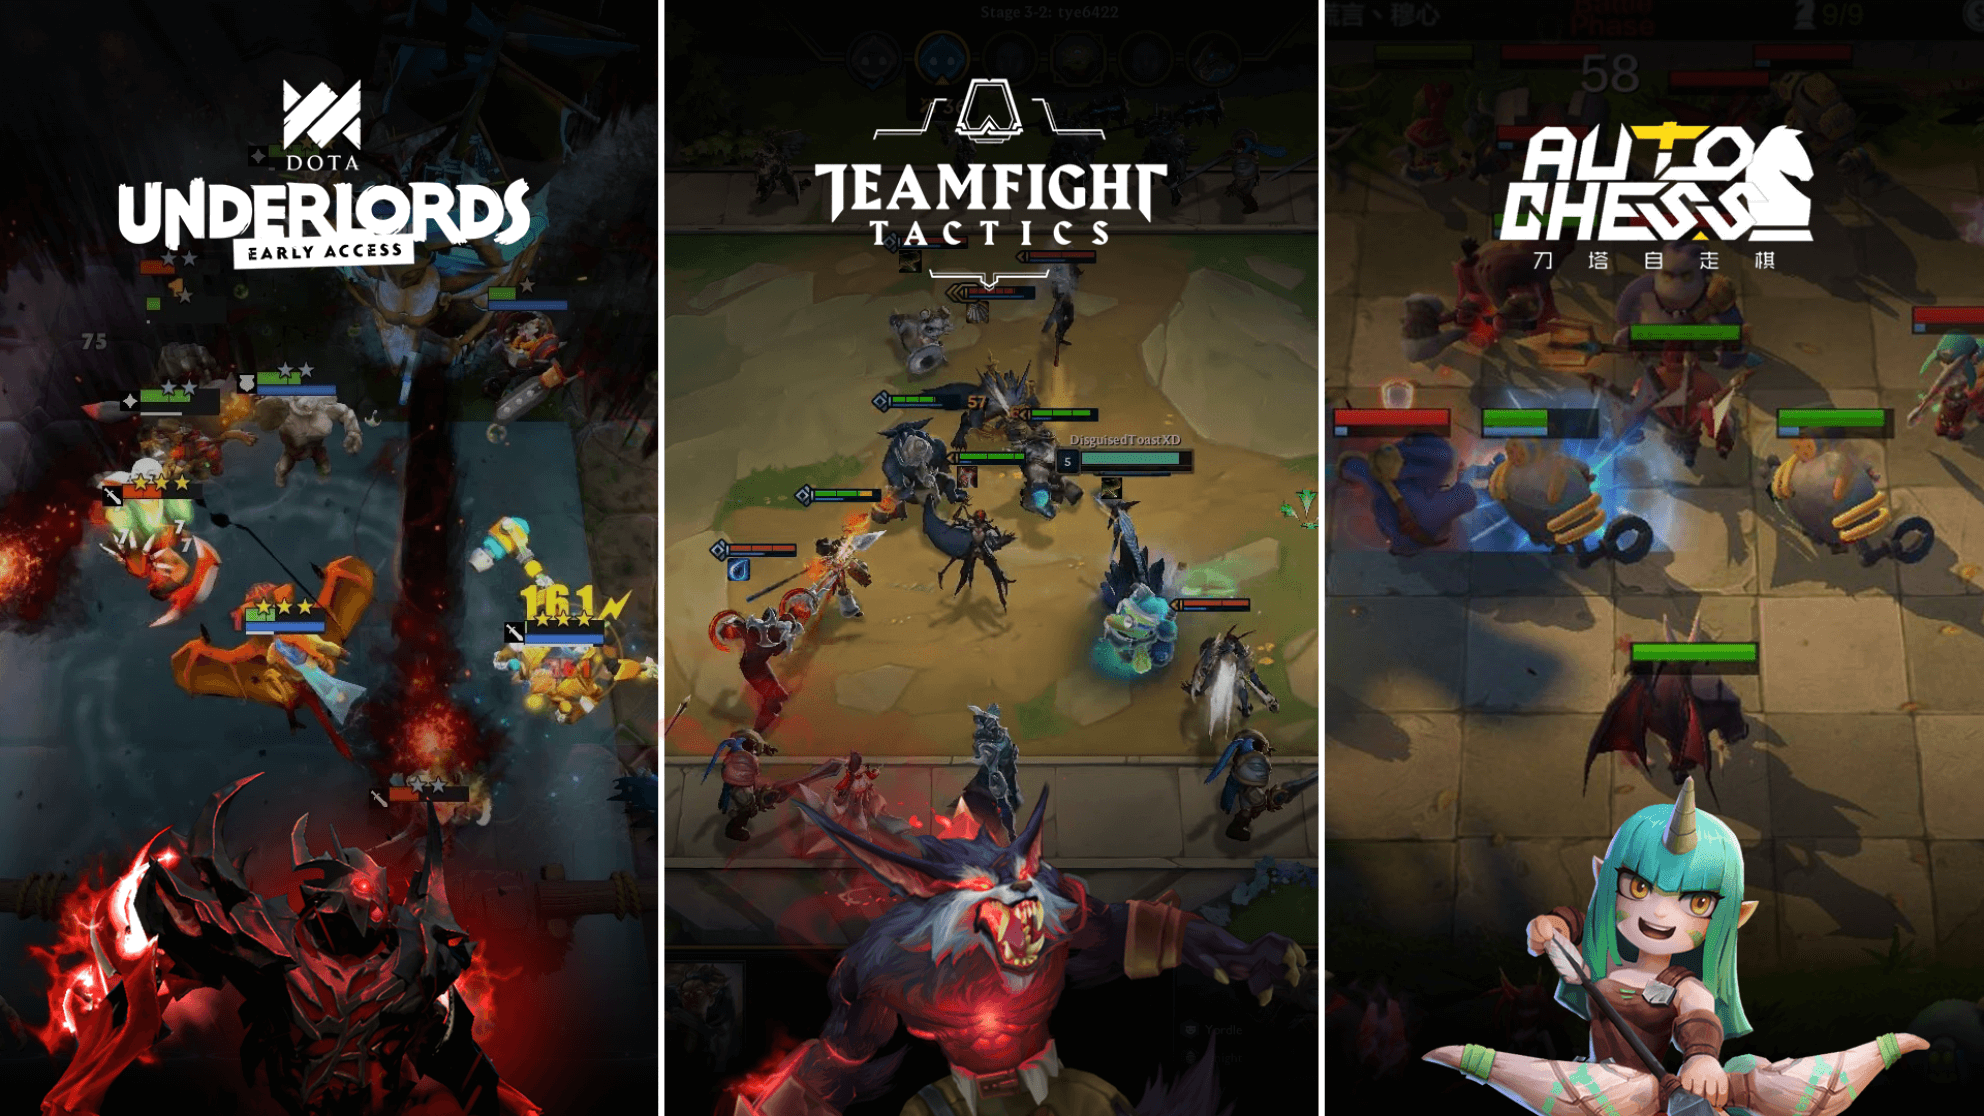 Dota Underlords and Teamfight Tactics